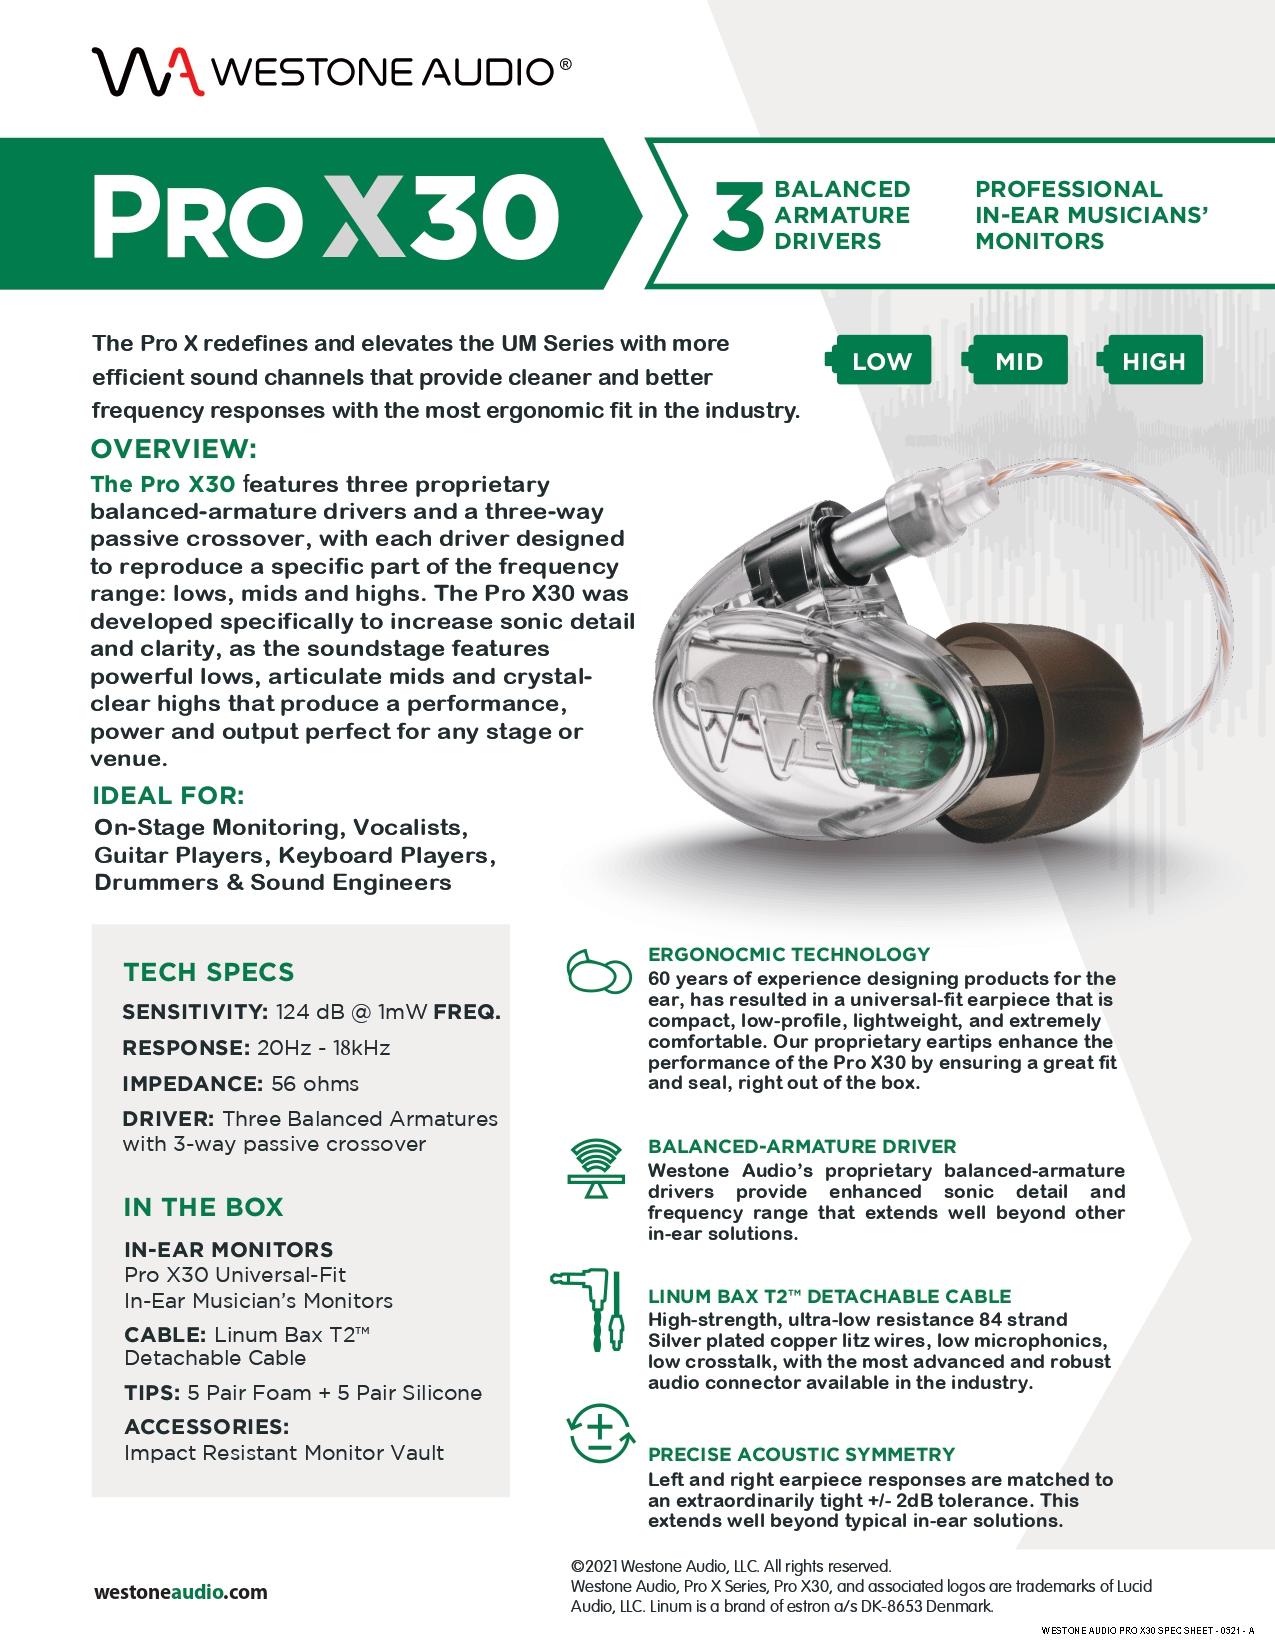 new-pro-x30-line-up-spec-sheet-page-0001.jpg